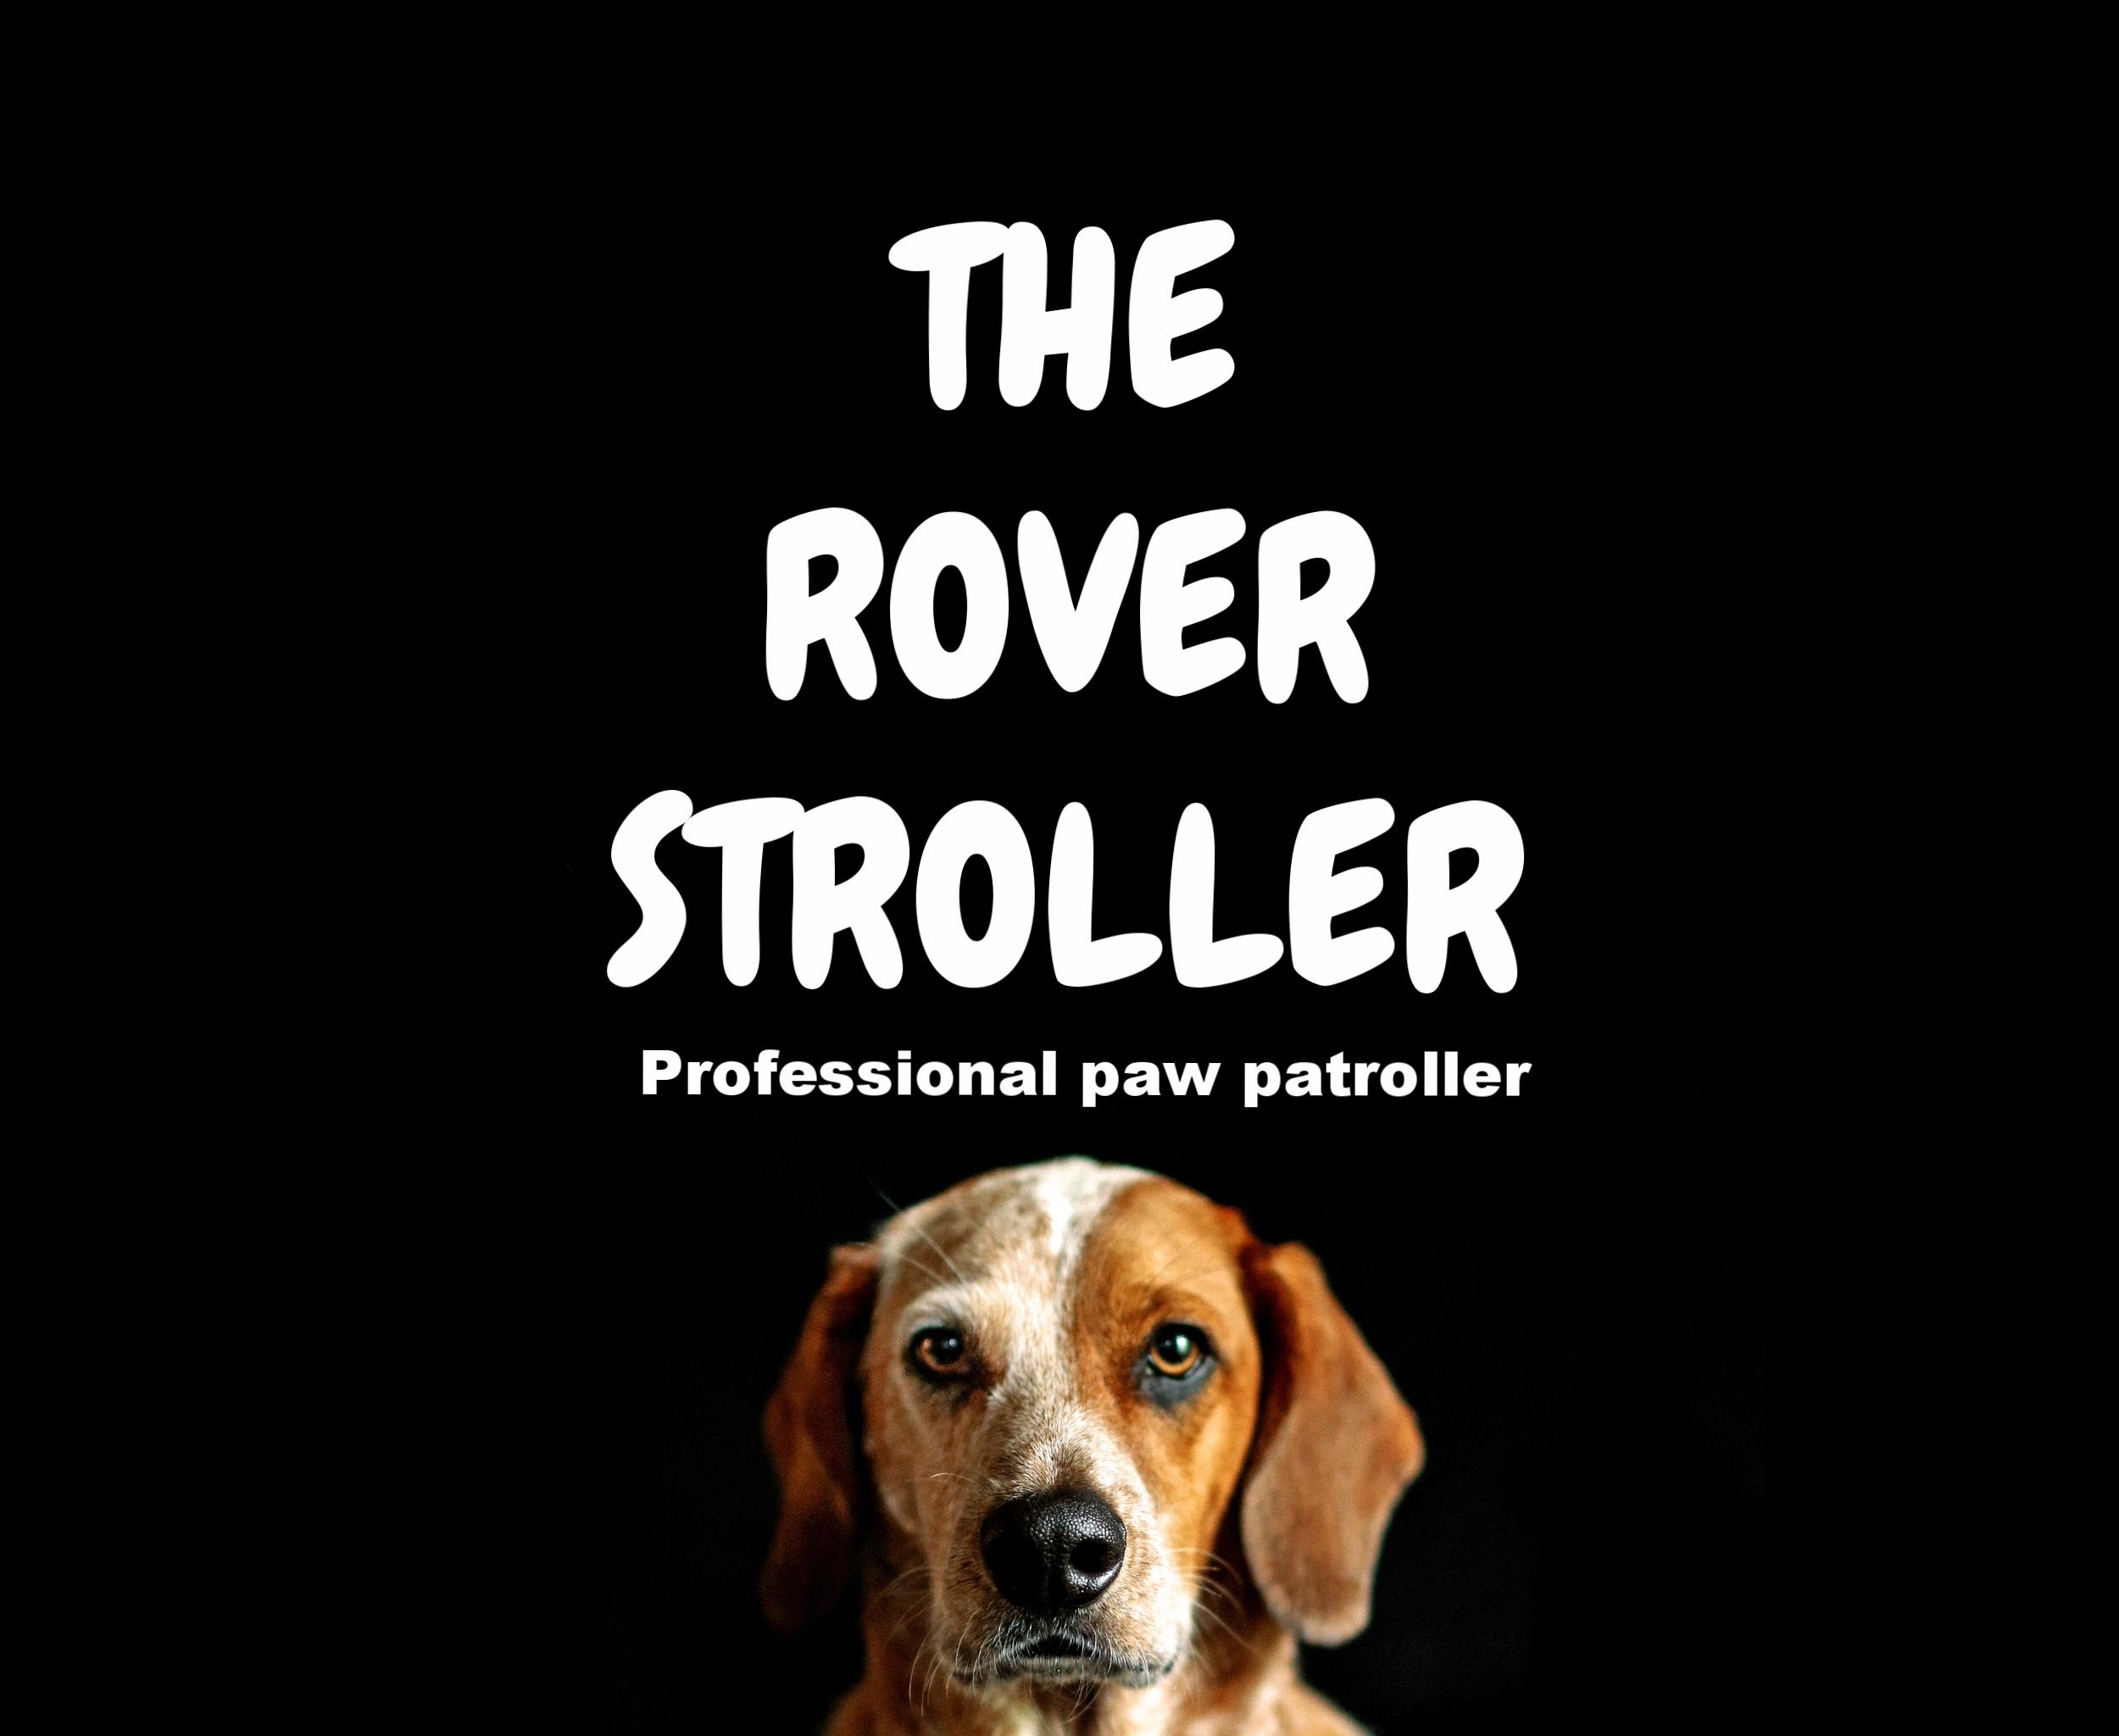 The Rover Stroller